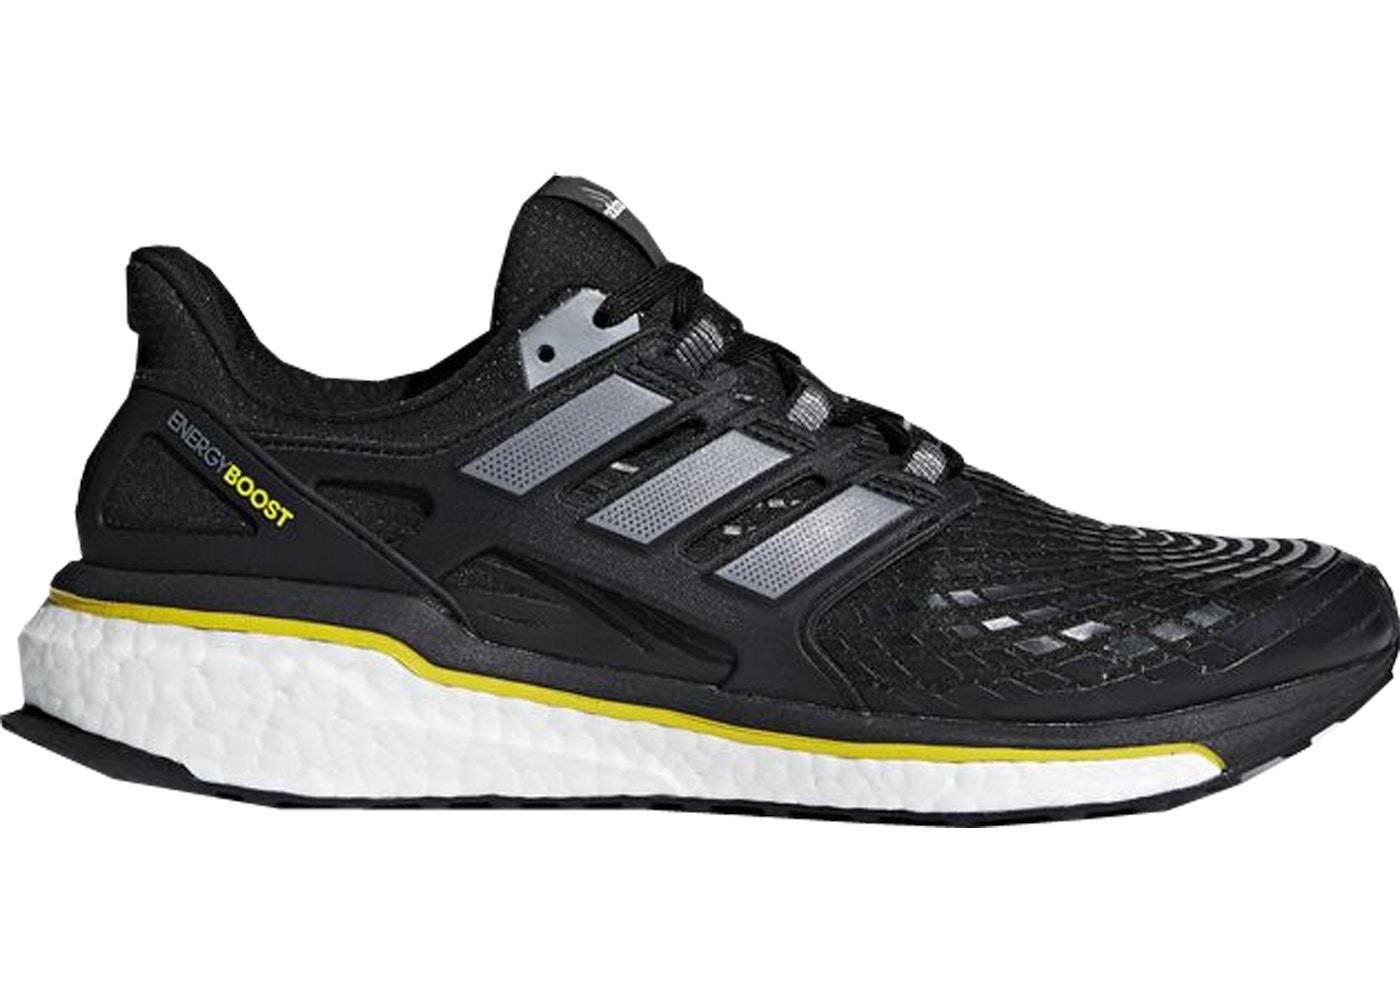 taille 40 0a595 e1da7 adidas Energy Boost 5th Anniversary Black Yellow